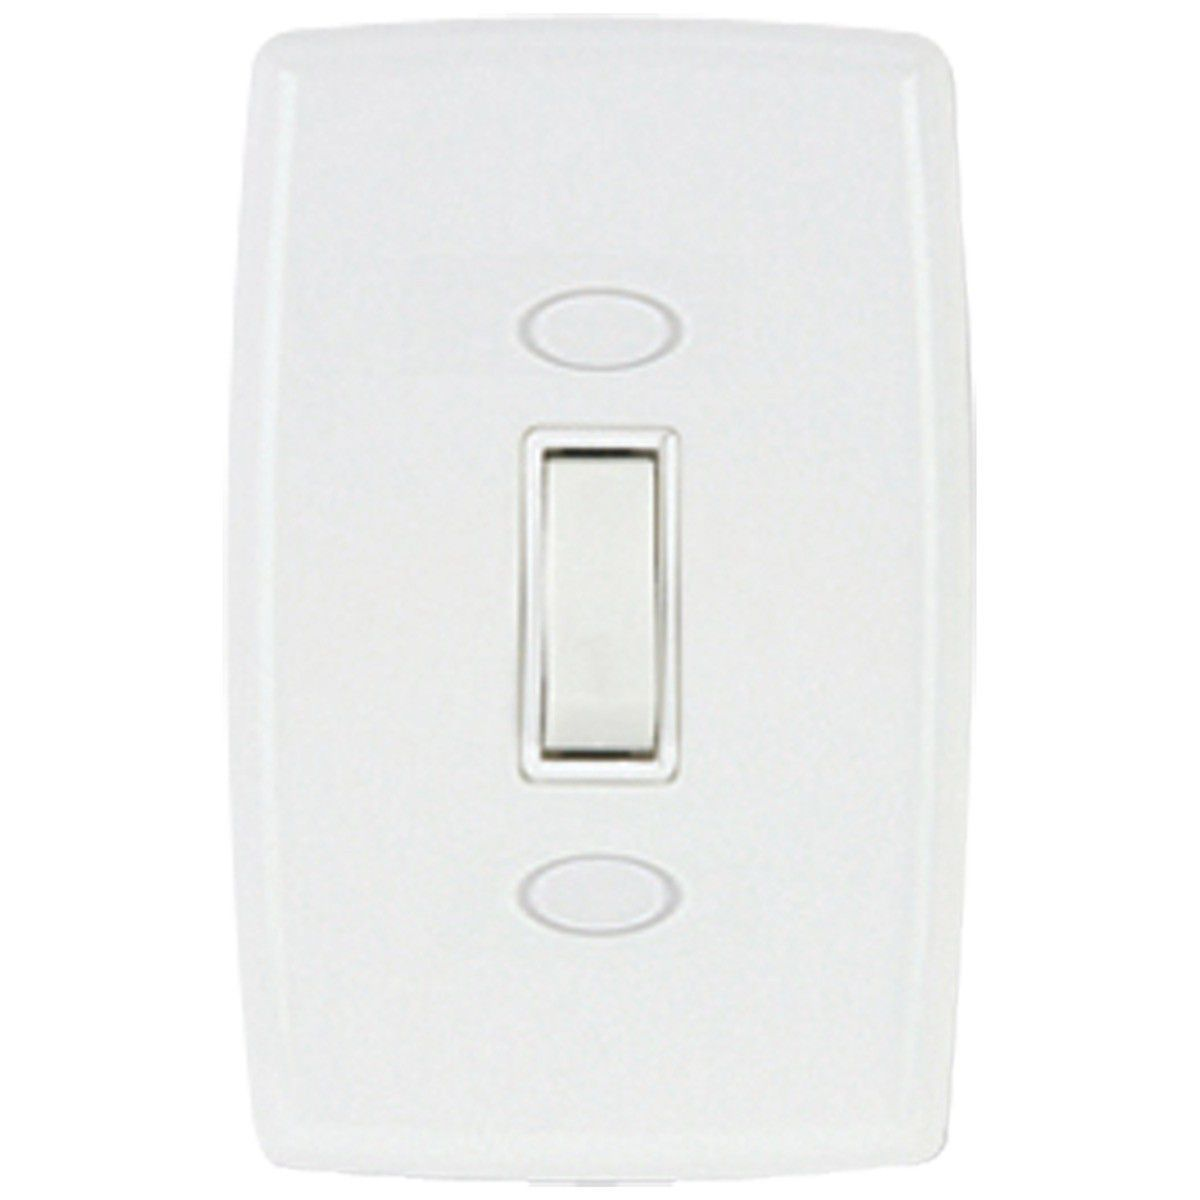 Interruptor Simples Safira Ilumi Cx/25